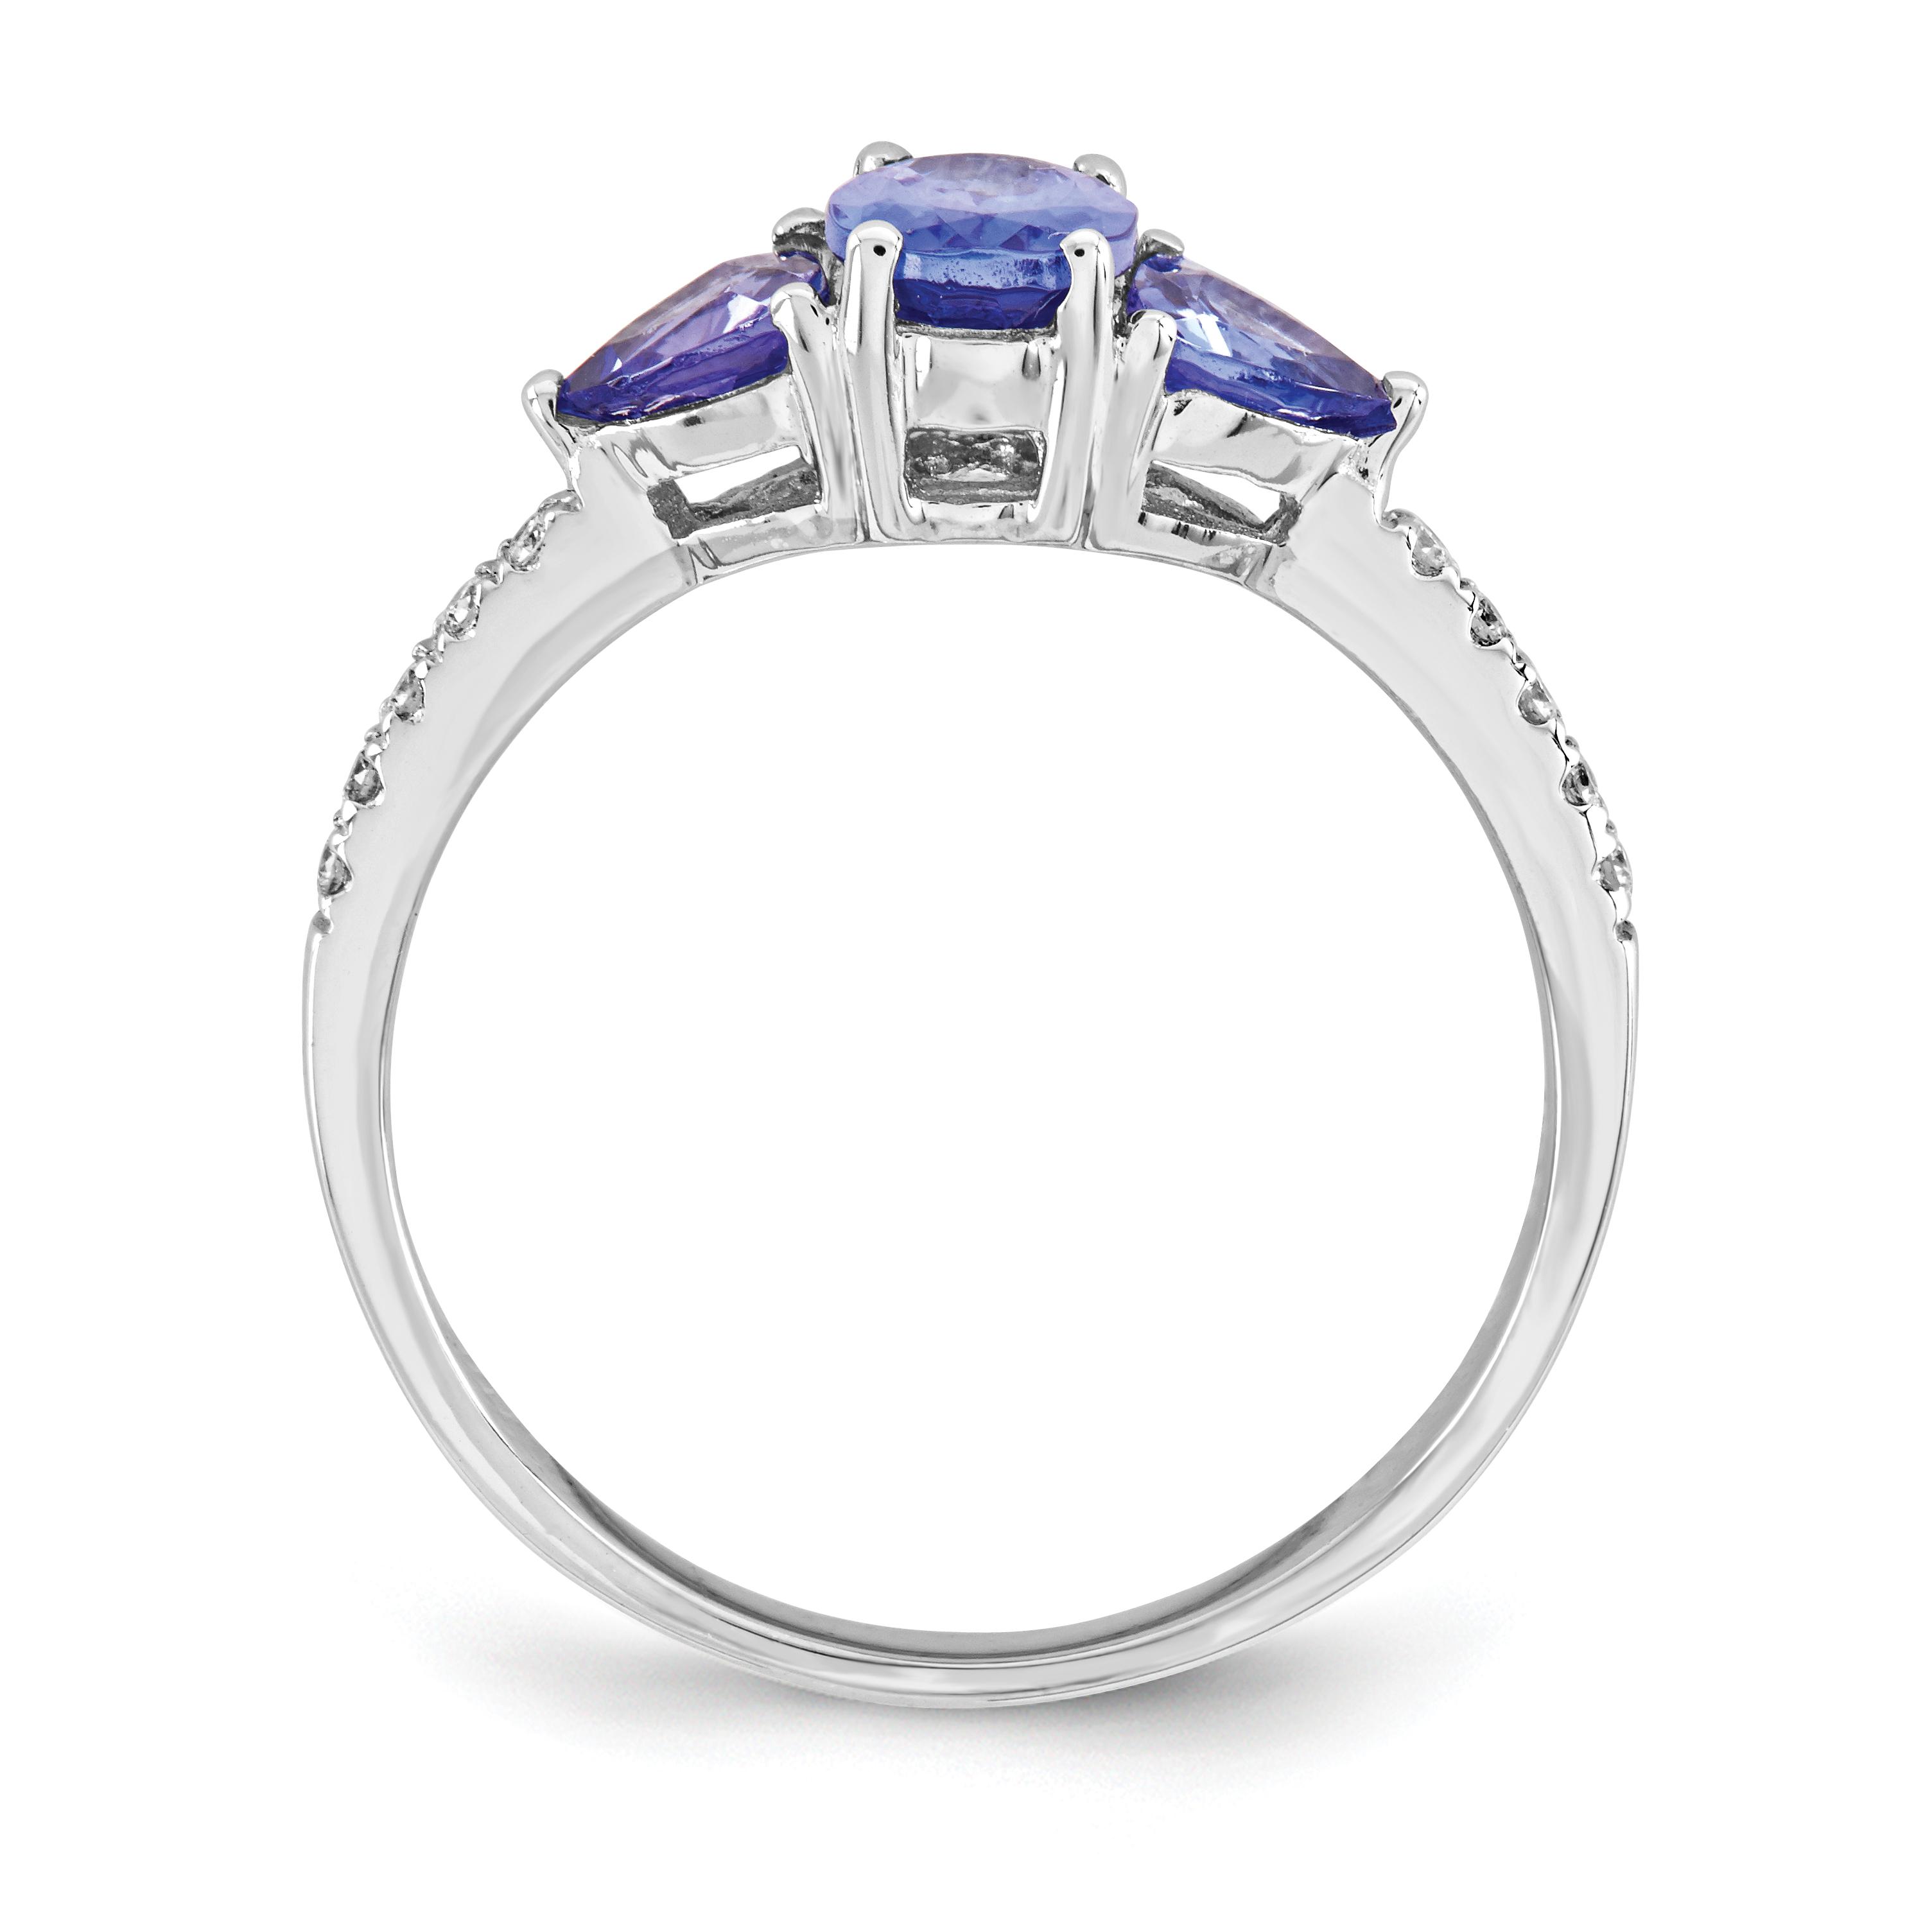 Fresh Image How Much is A 14k Diamond Ring Worth Engagement Wedding Diam